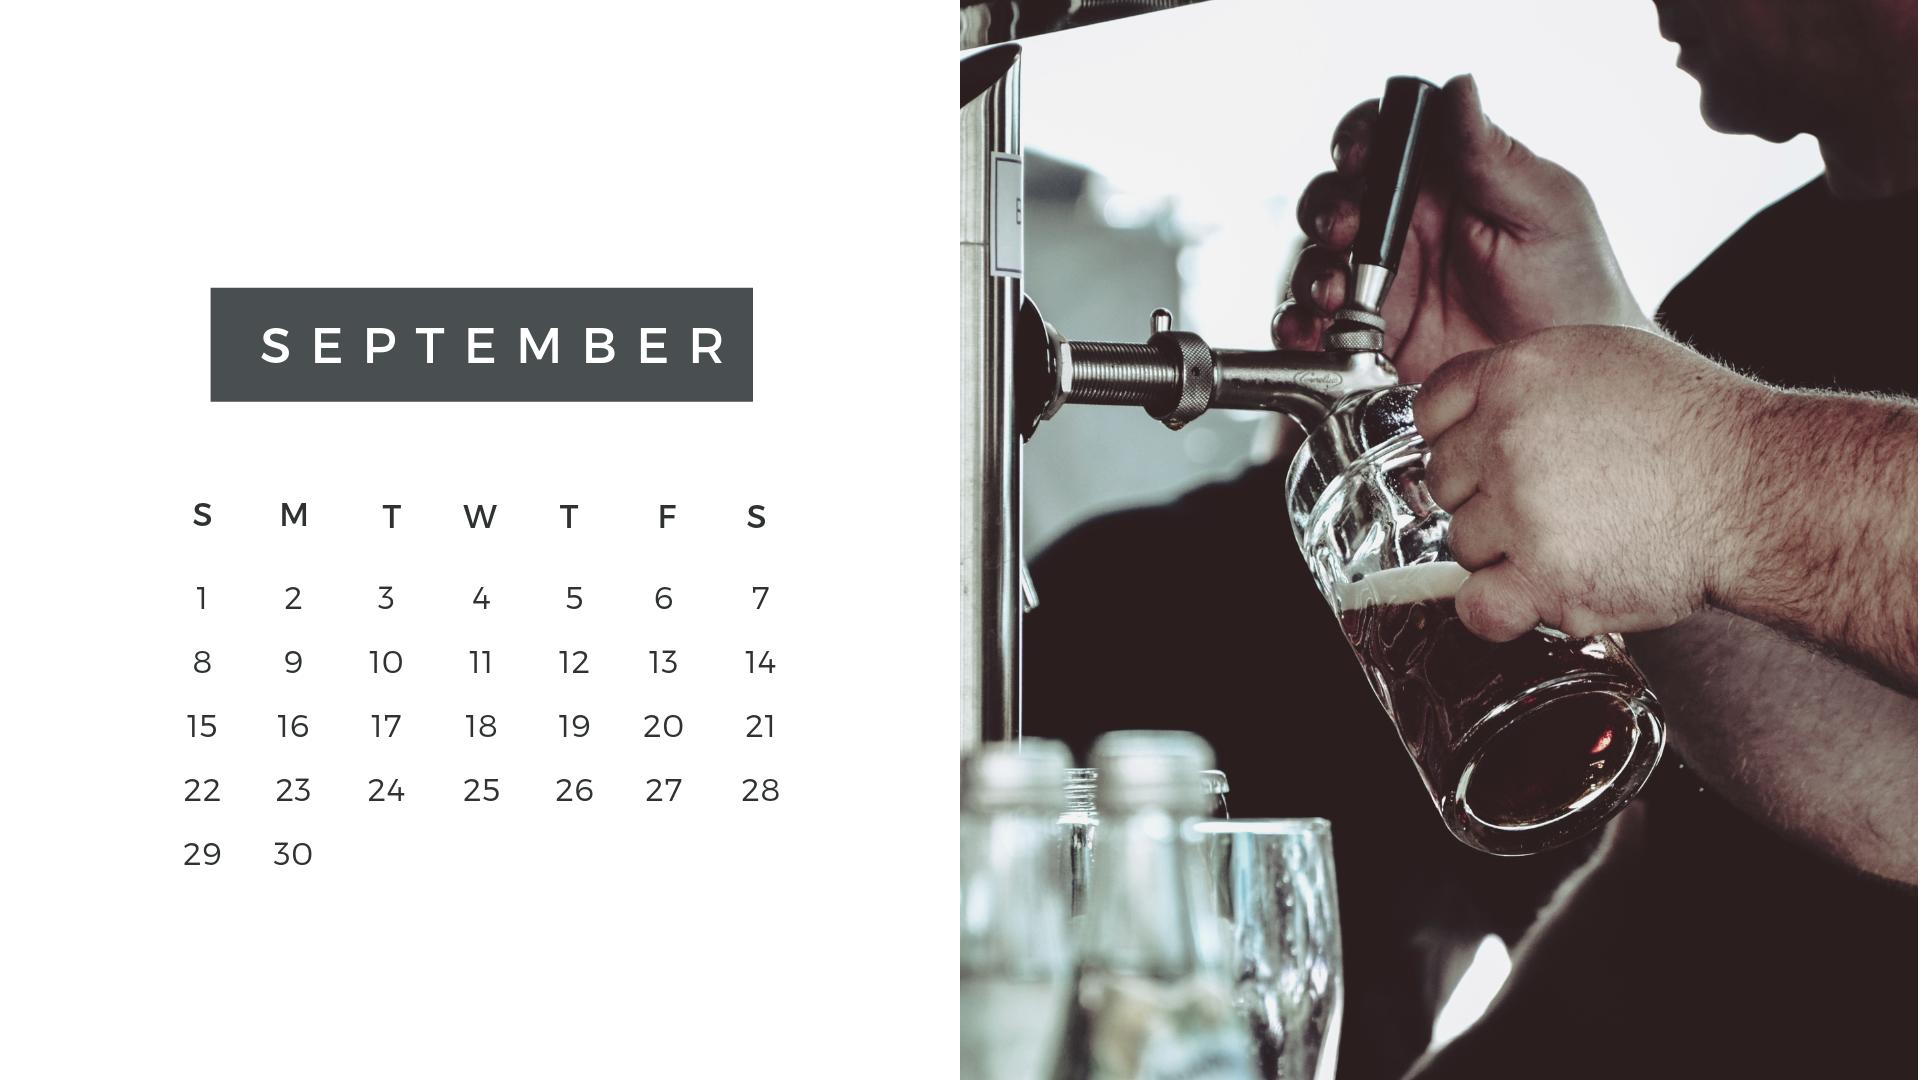 chicago-fall-festival-calendar-september-kourtney-murray-chicago-real-estate.png